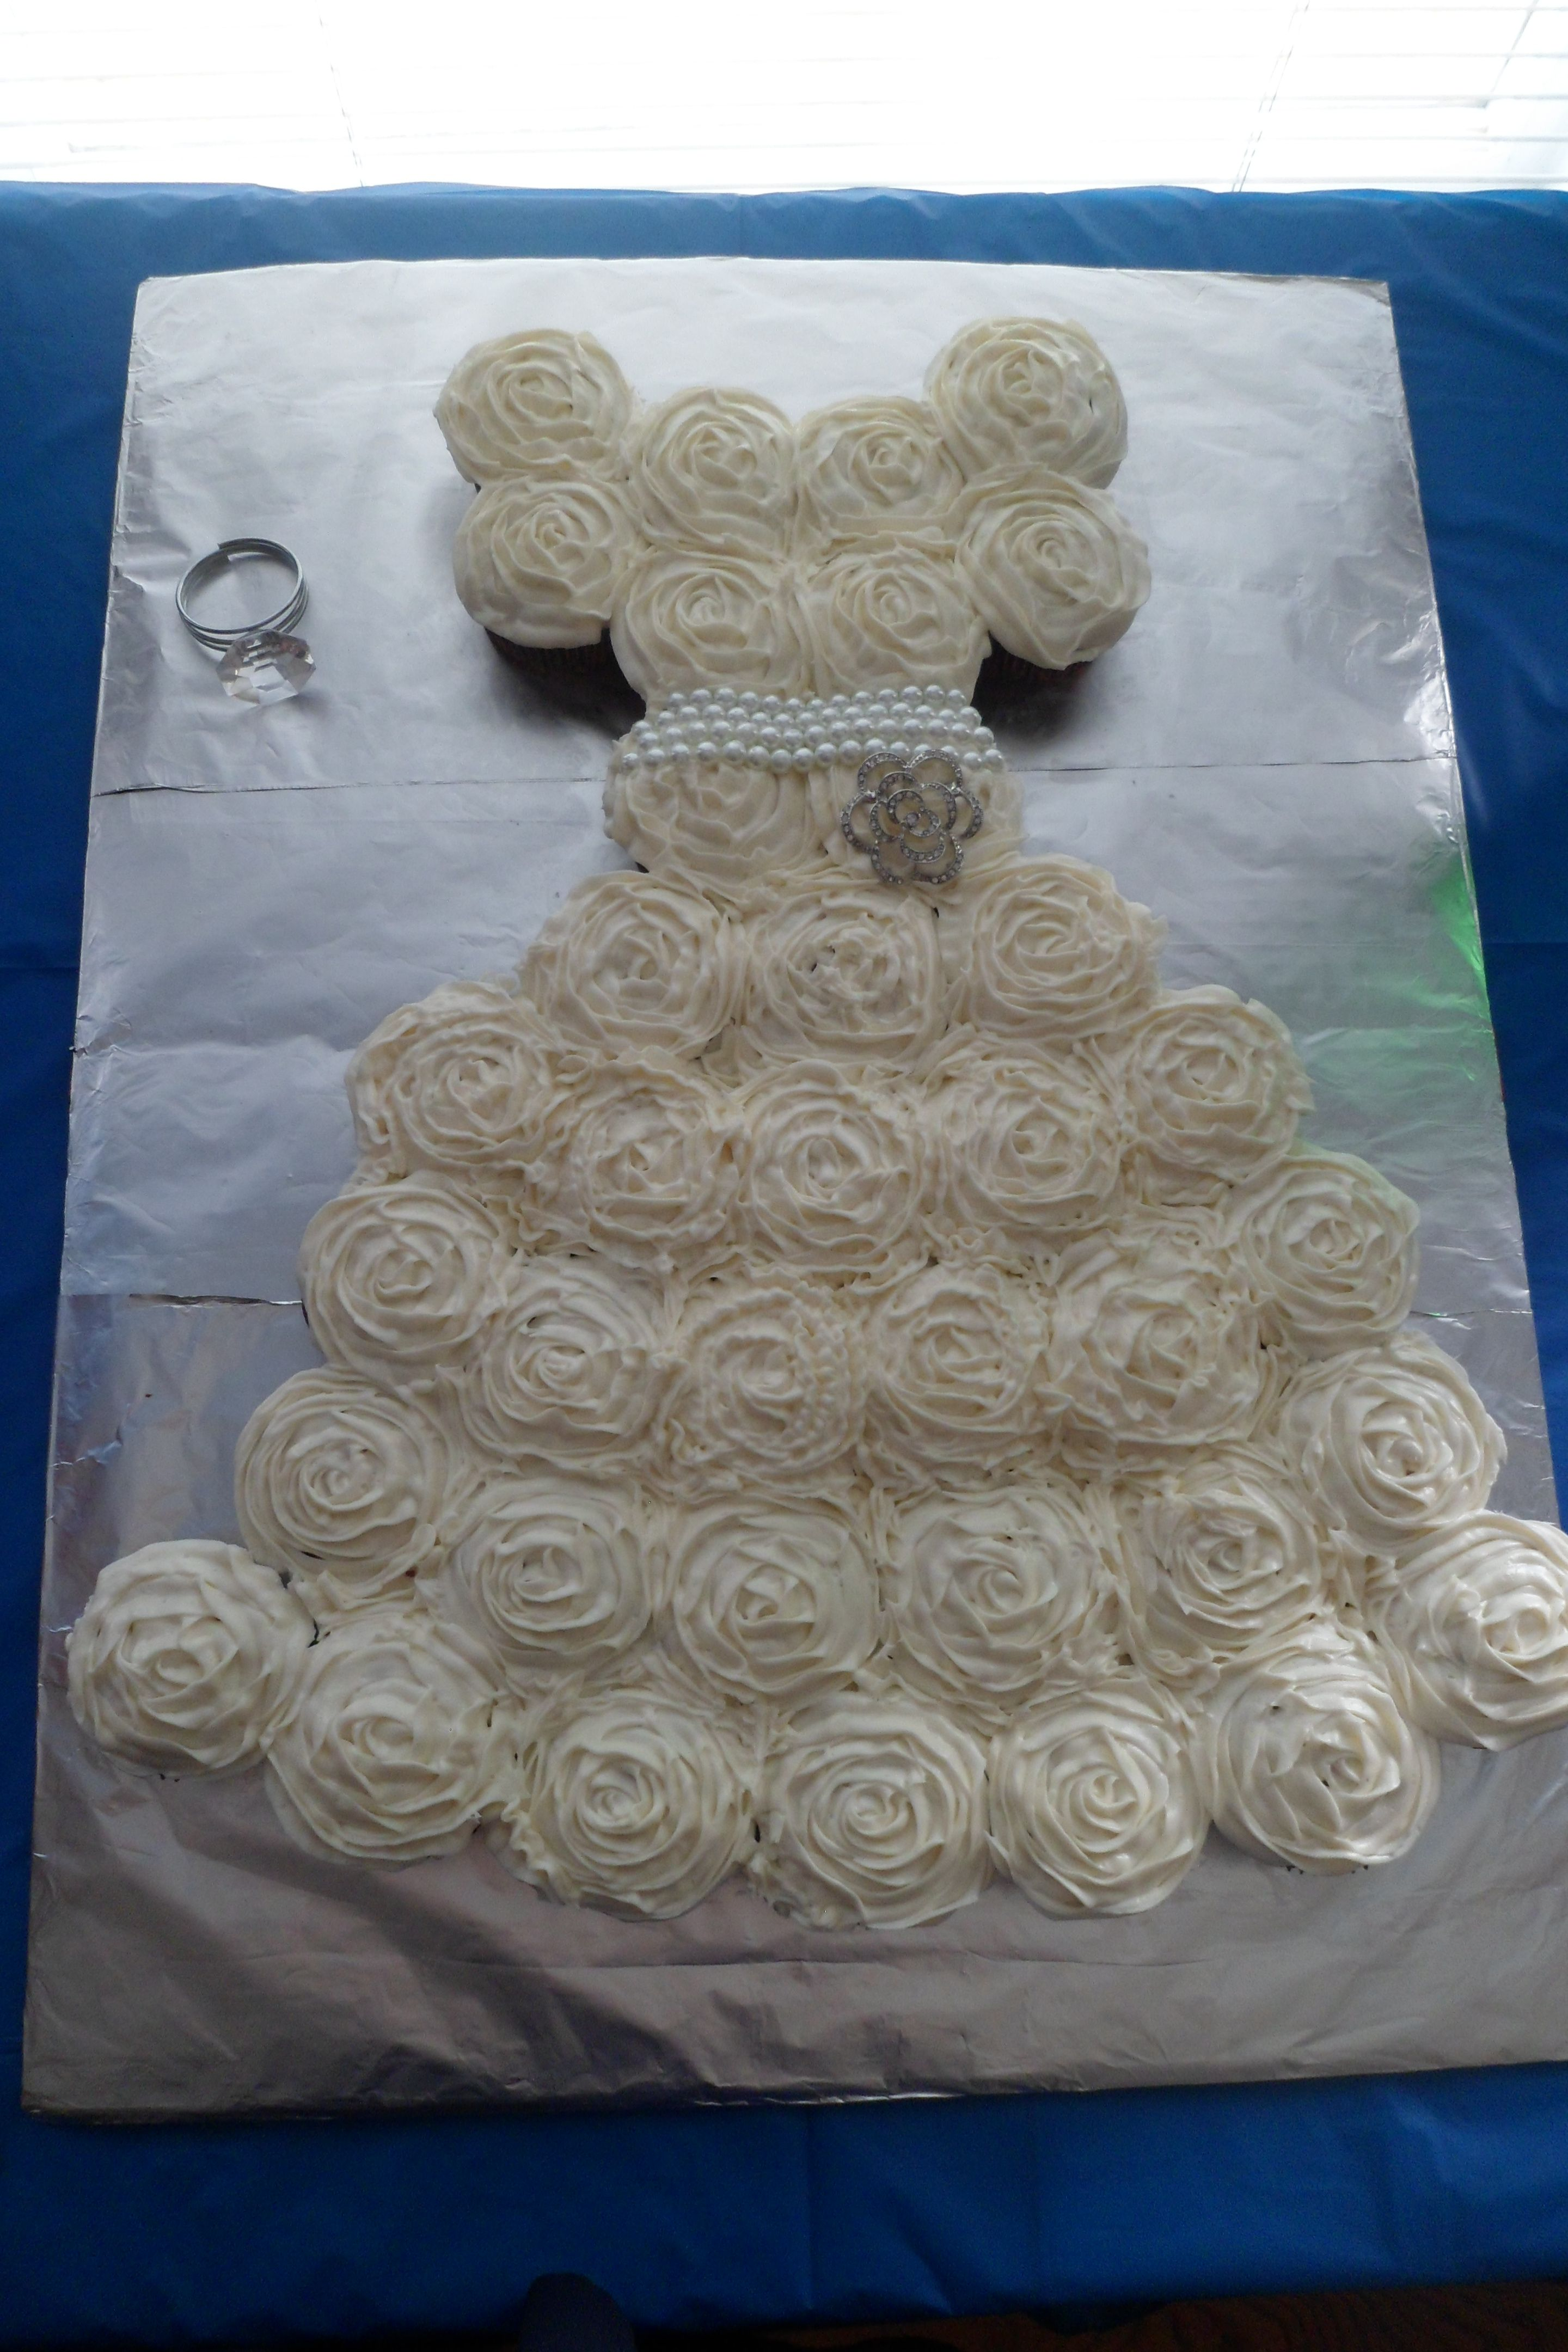 cupcake recipes for bridal shower%0A DIY Bridal Shower Cake Wedding Dress Cupcakes  Red Velvet  I made this for